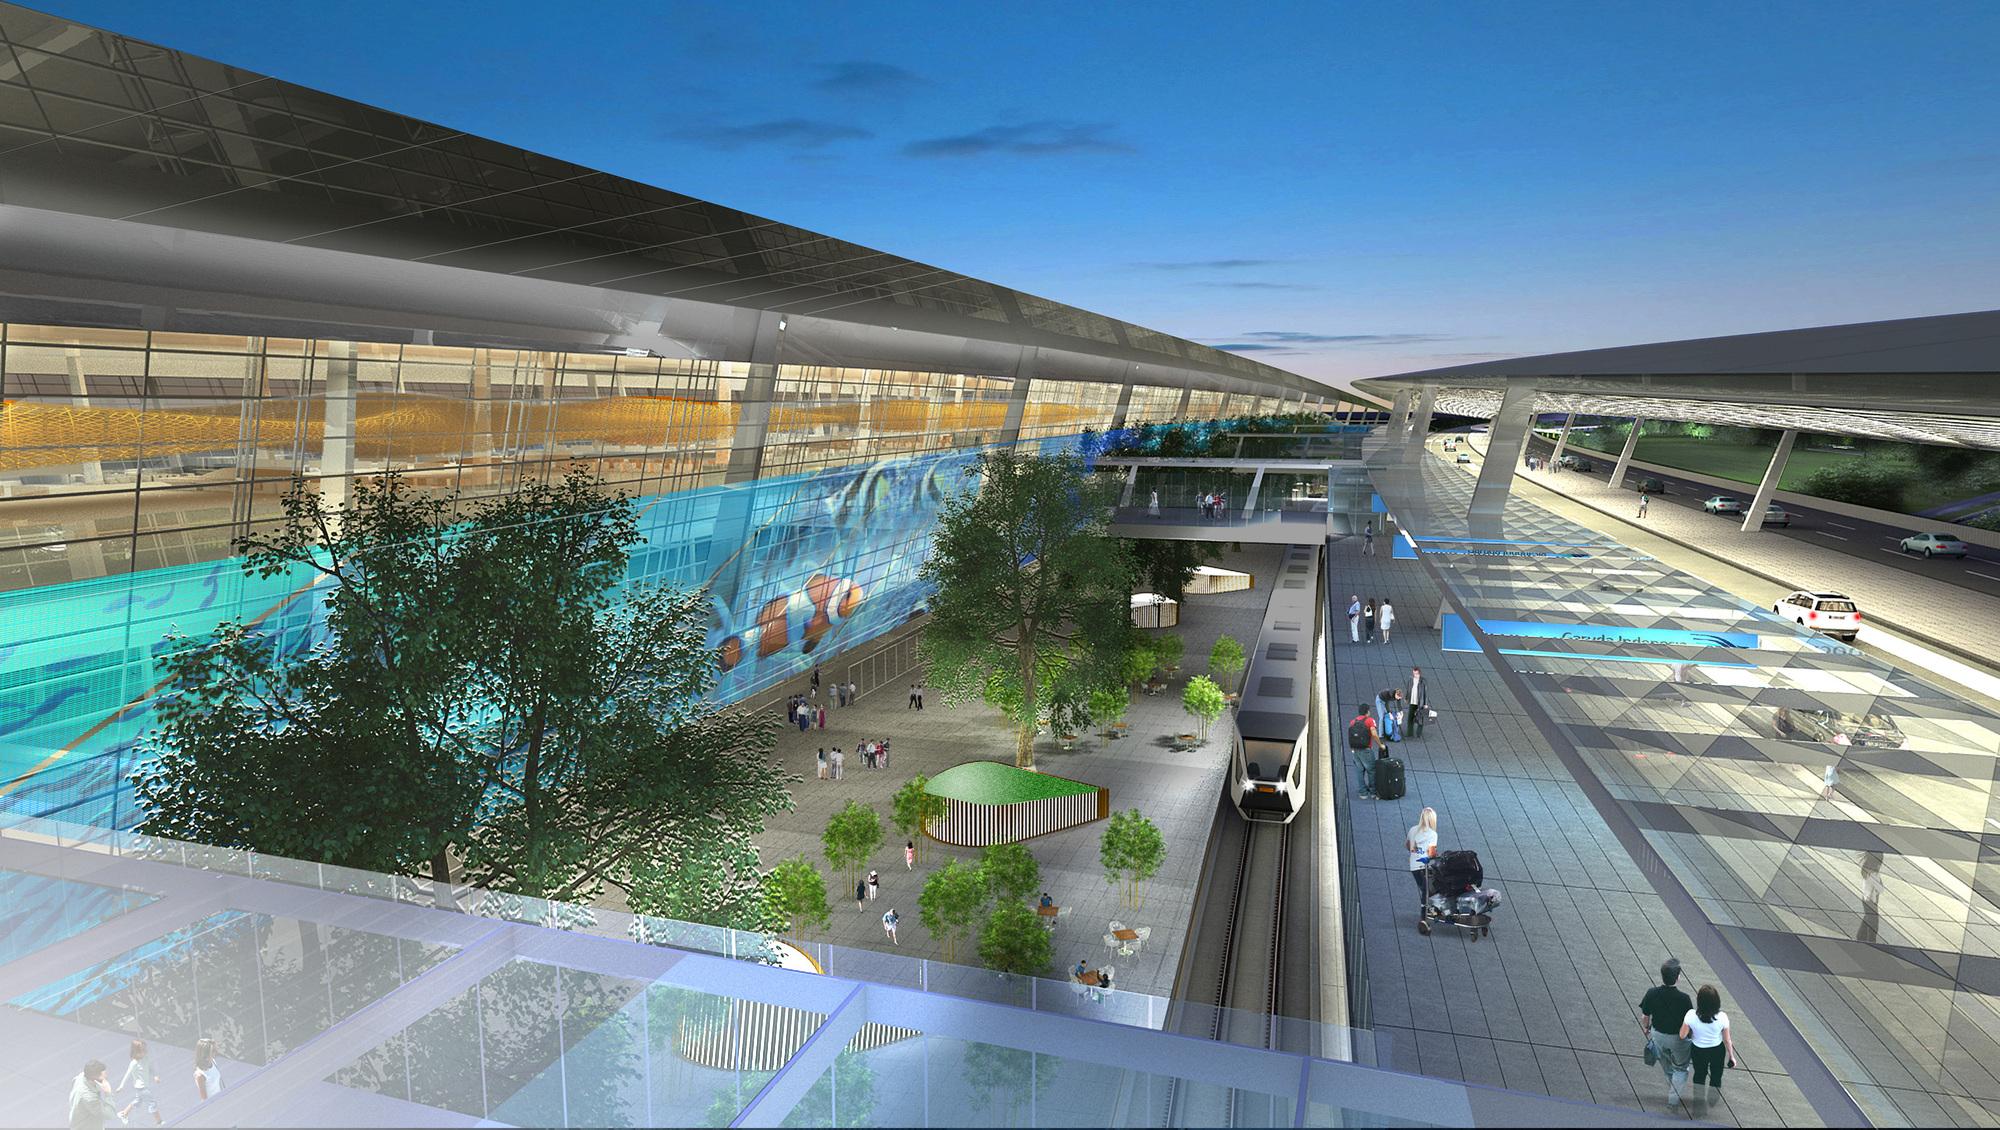 Soekarno Hatta International Airport Hotel